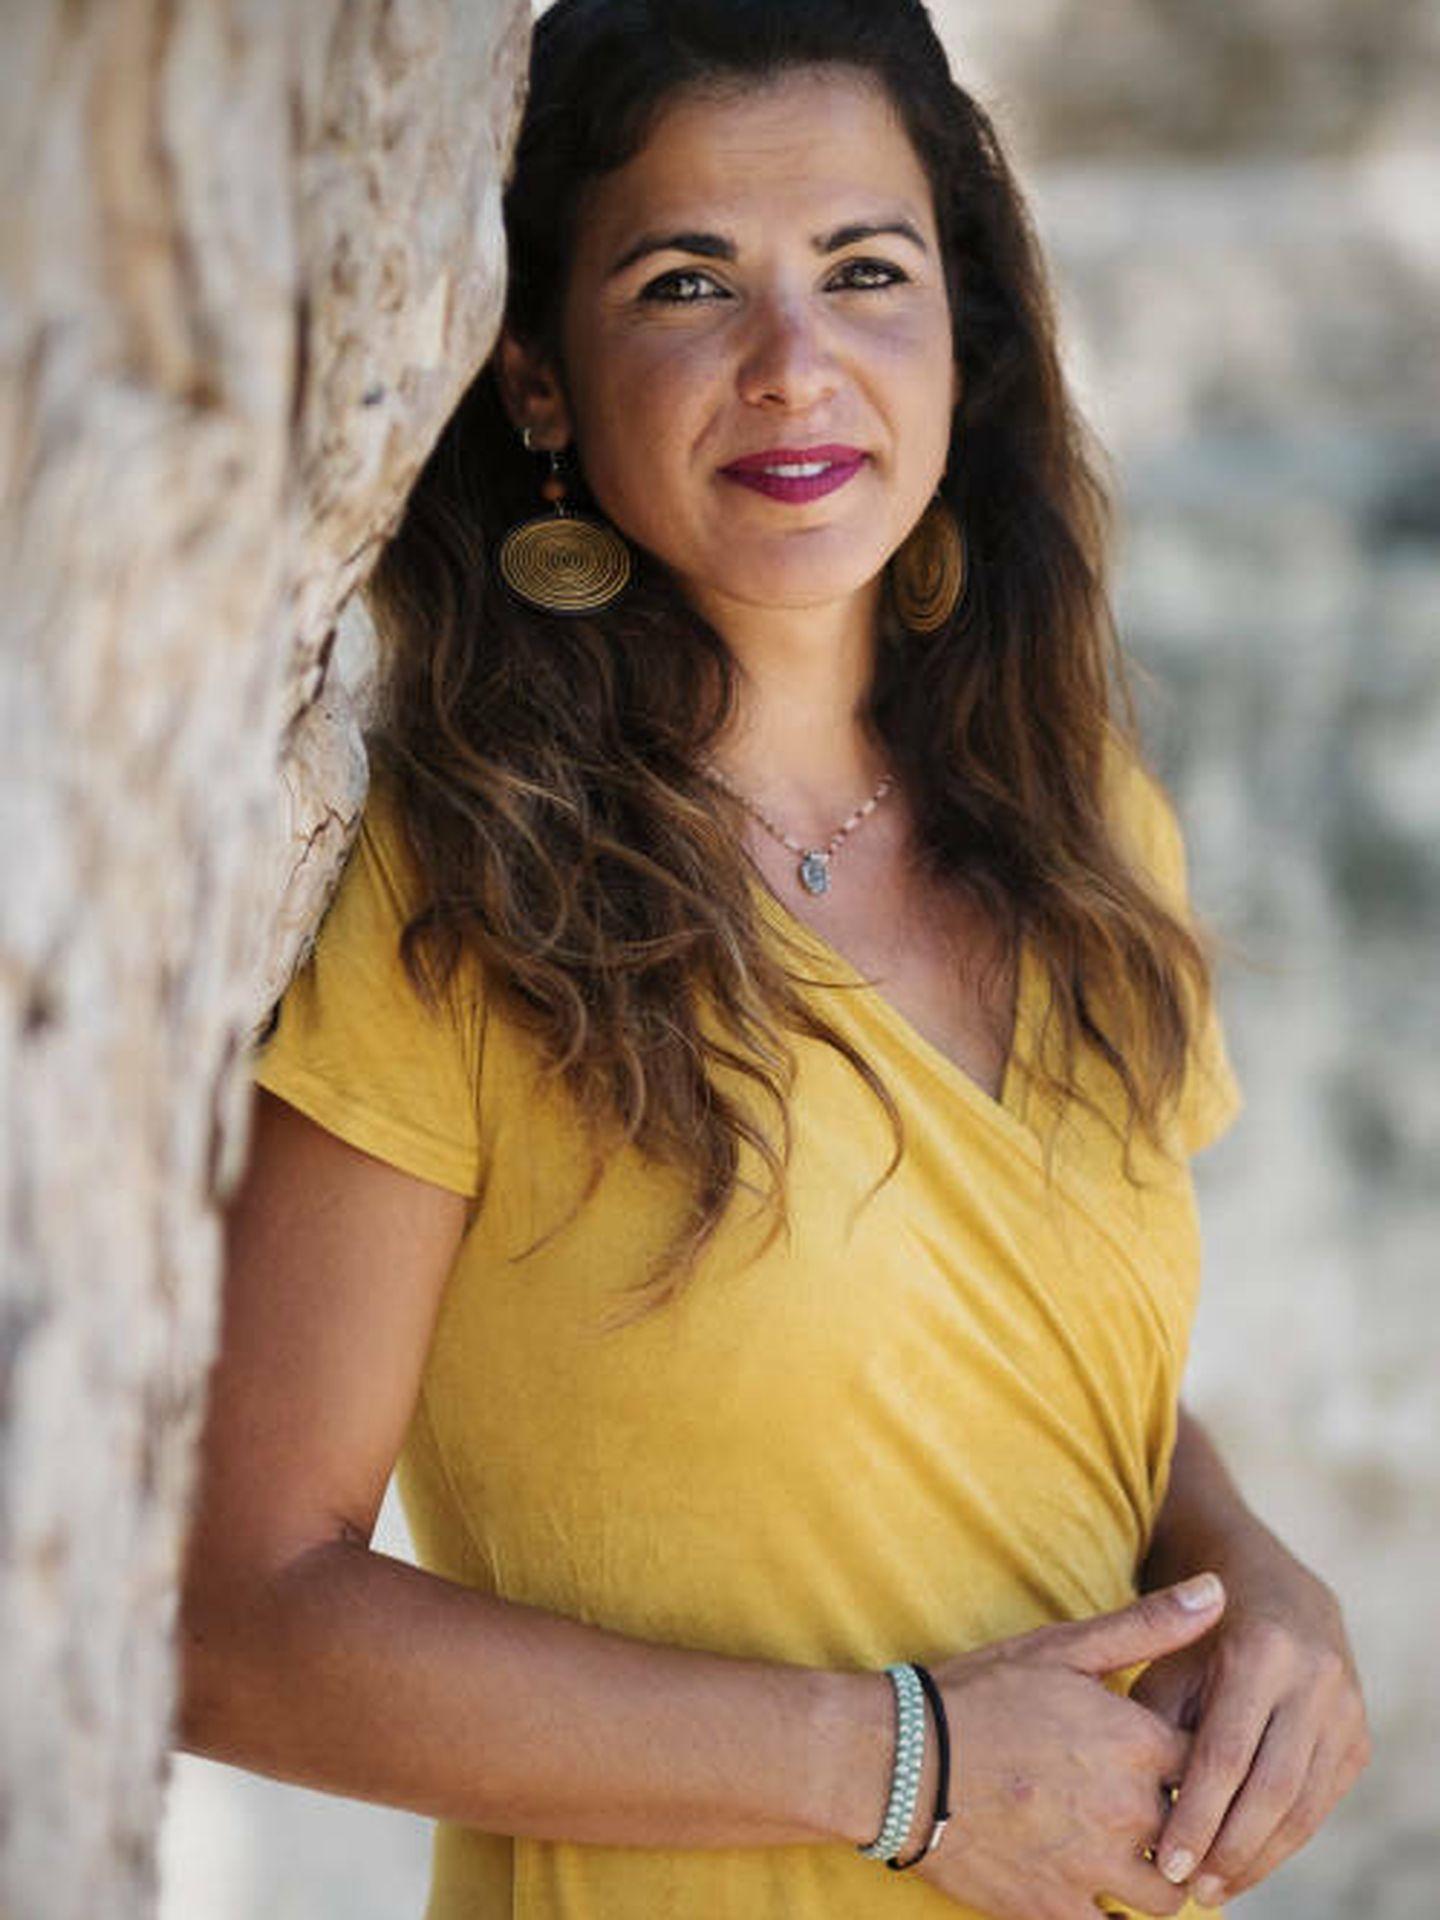 Teresa Rodríguez, secretaria general de Podemos Andalucía. (Pepo Herrera)